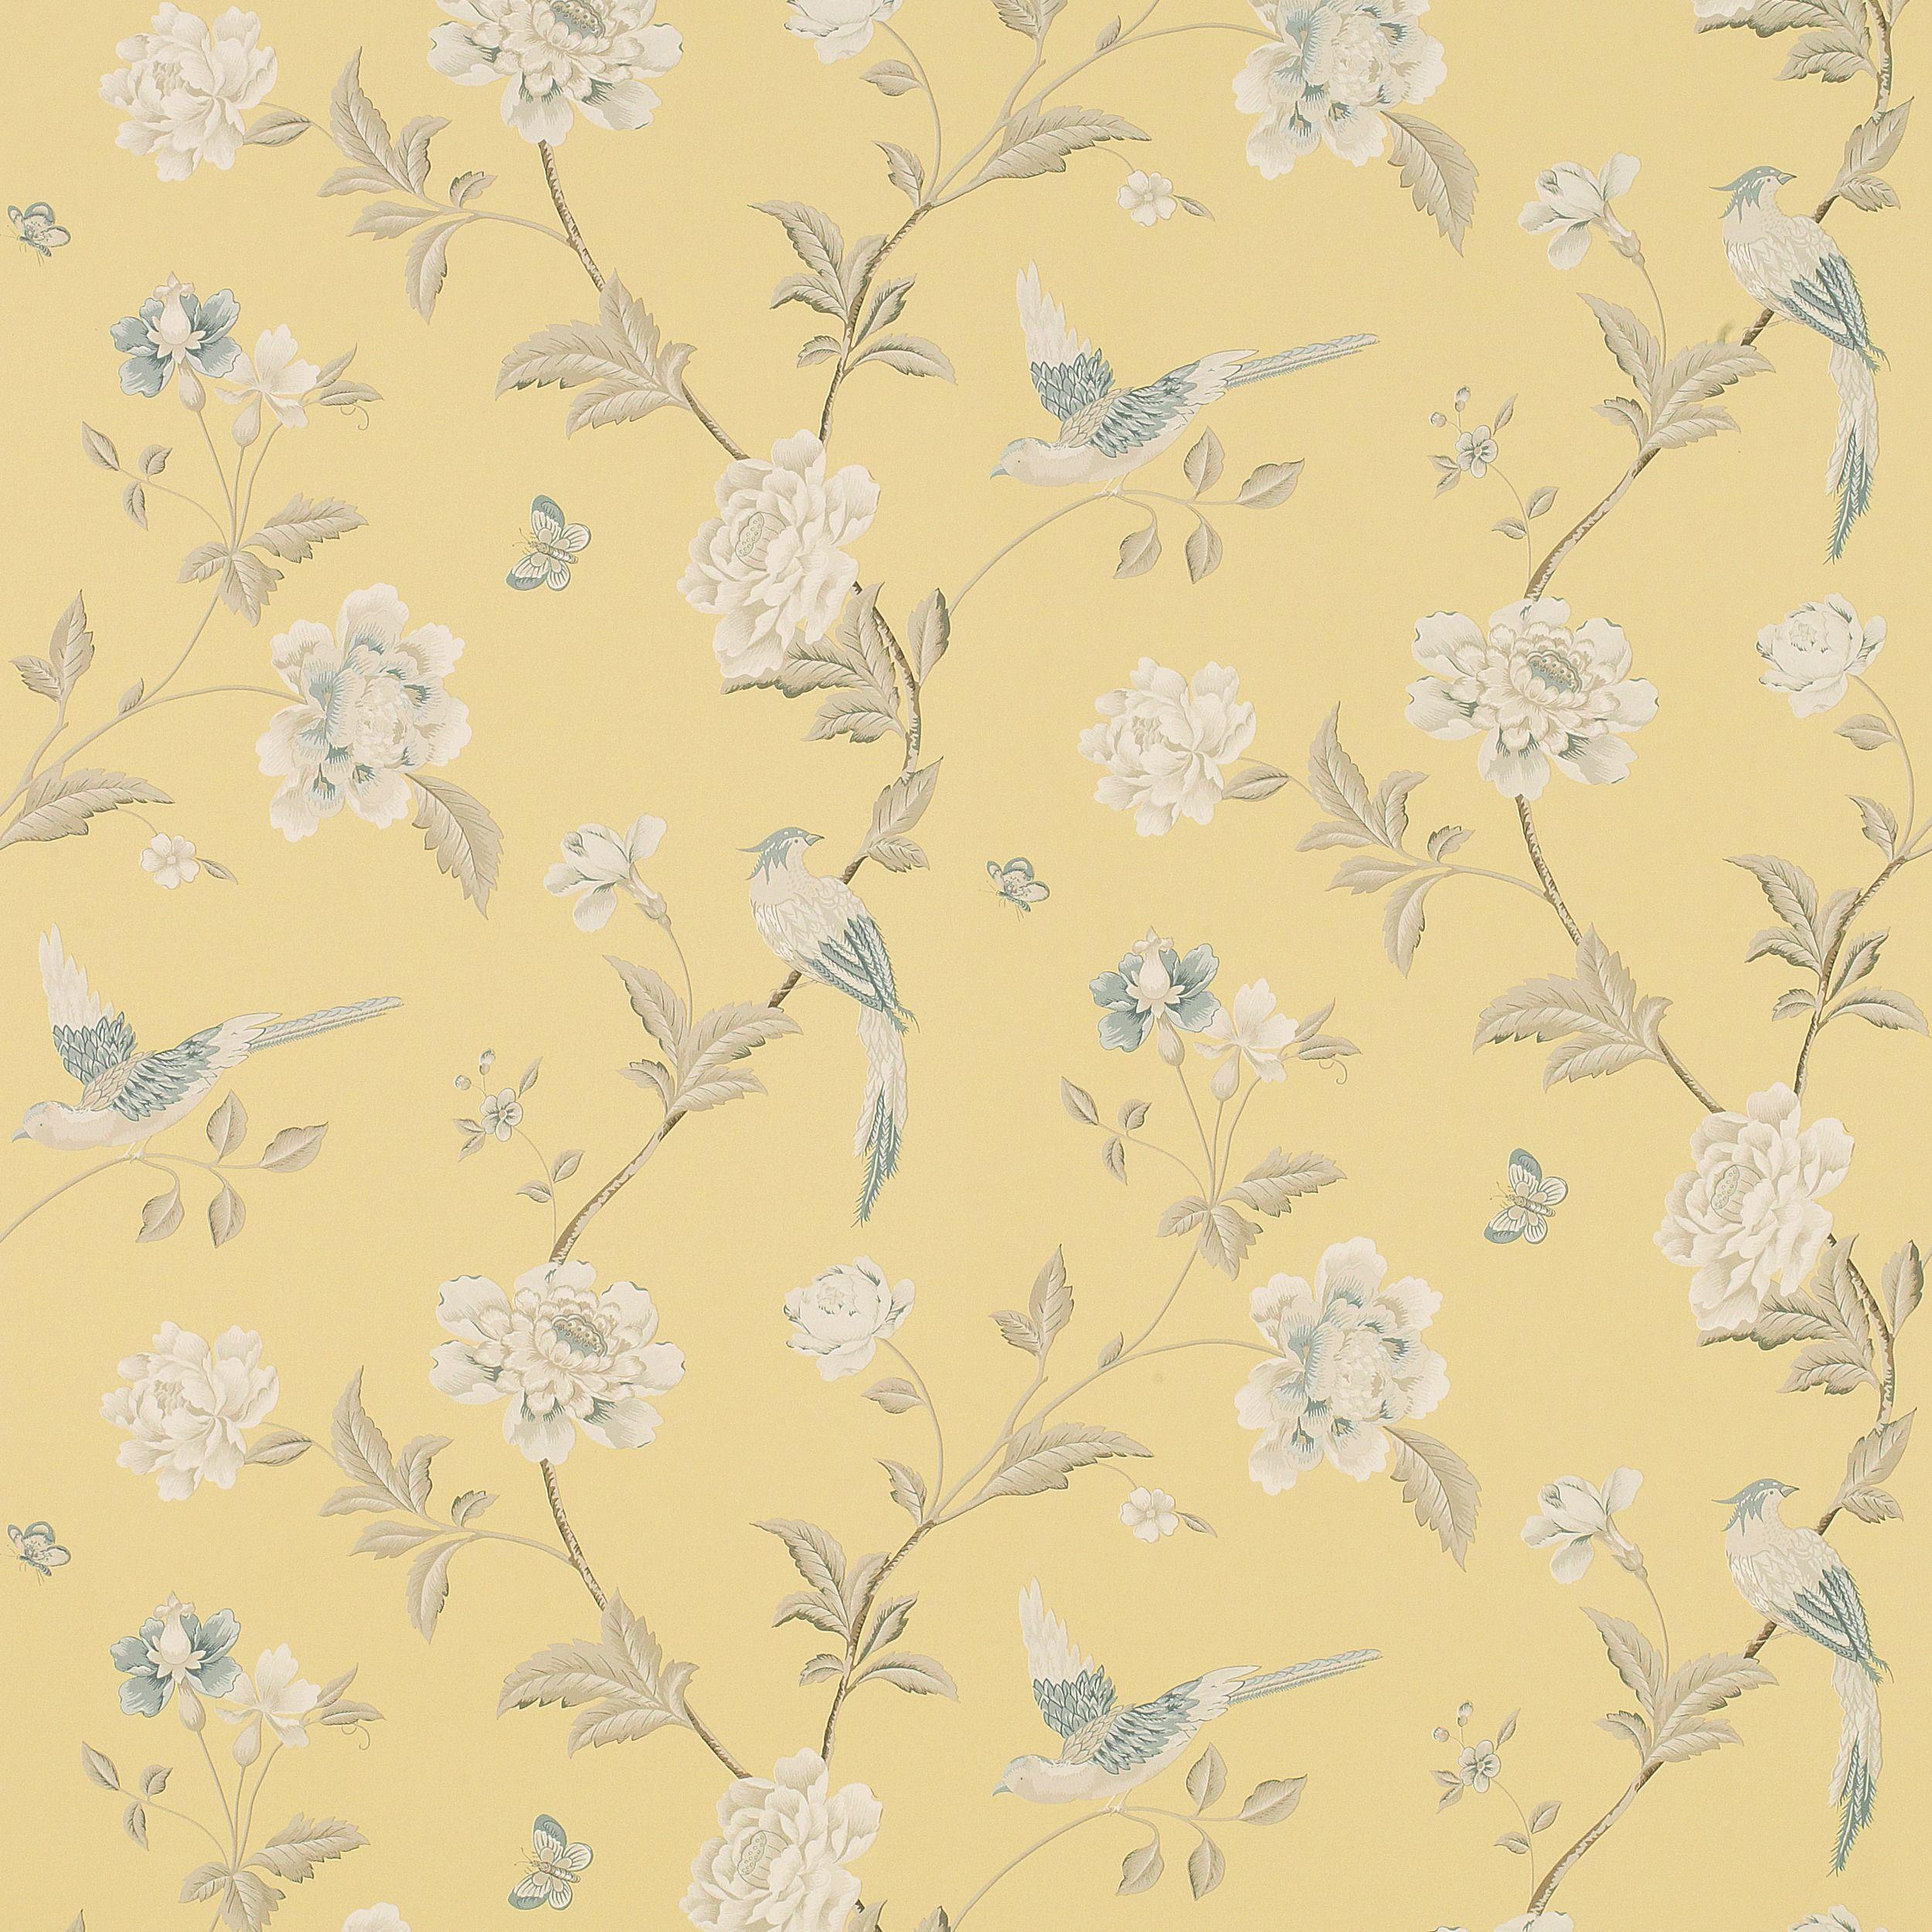 Elveden Camomile Wallpaper An Elegant Archive Print Depicting